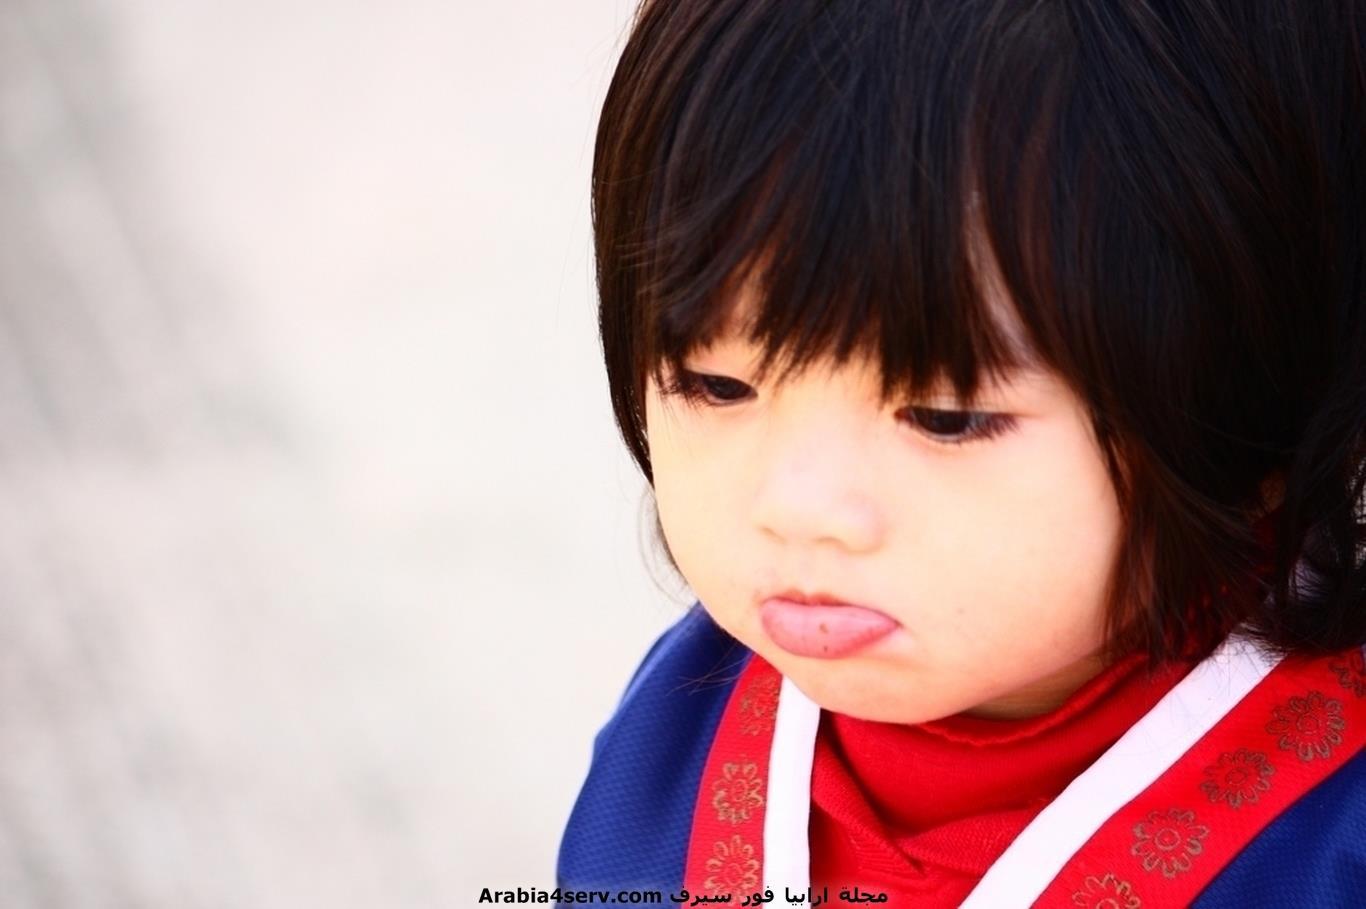 صور-وخلفيات-اطفال-كوريين-1